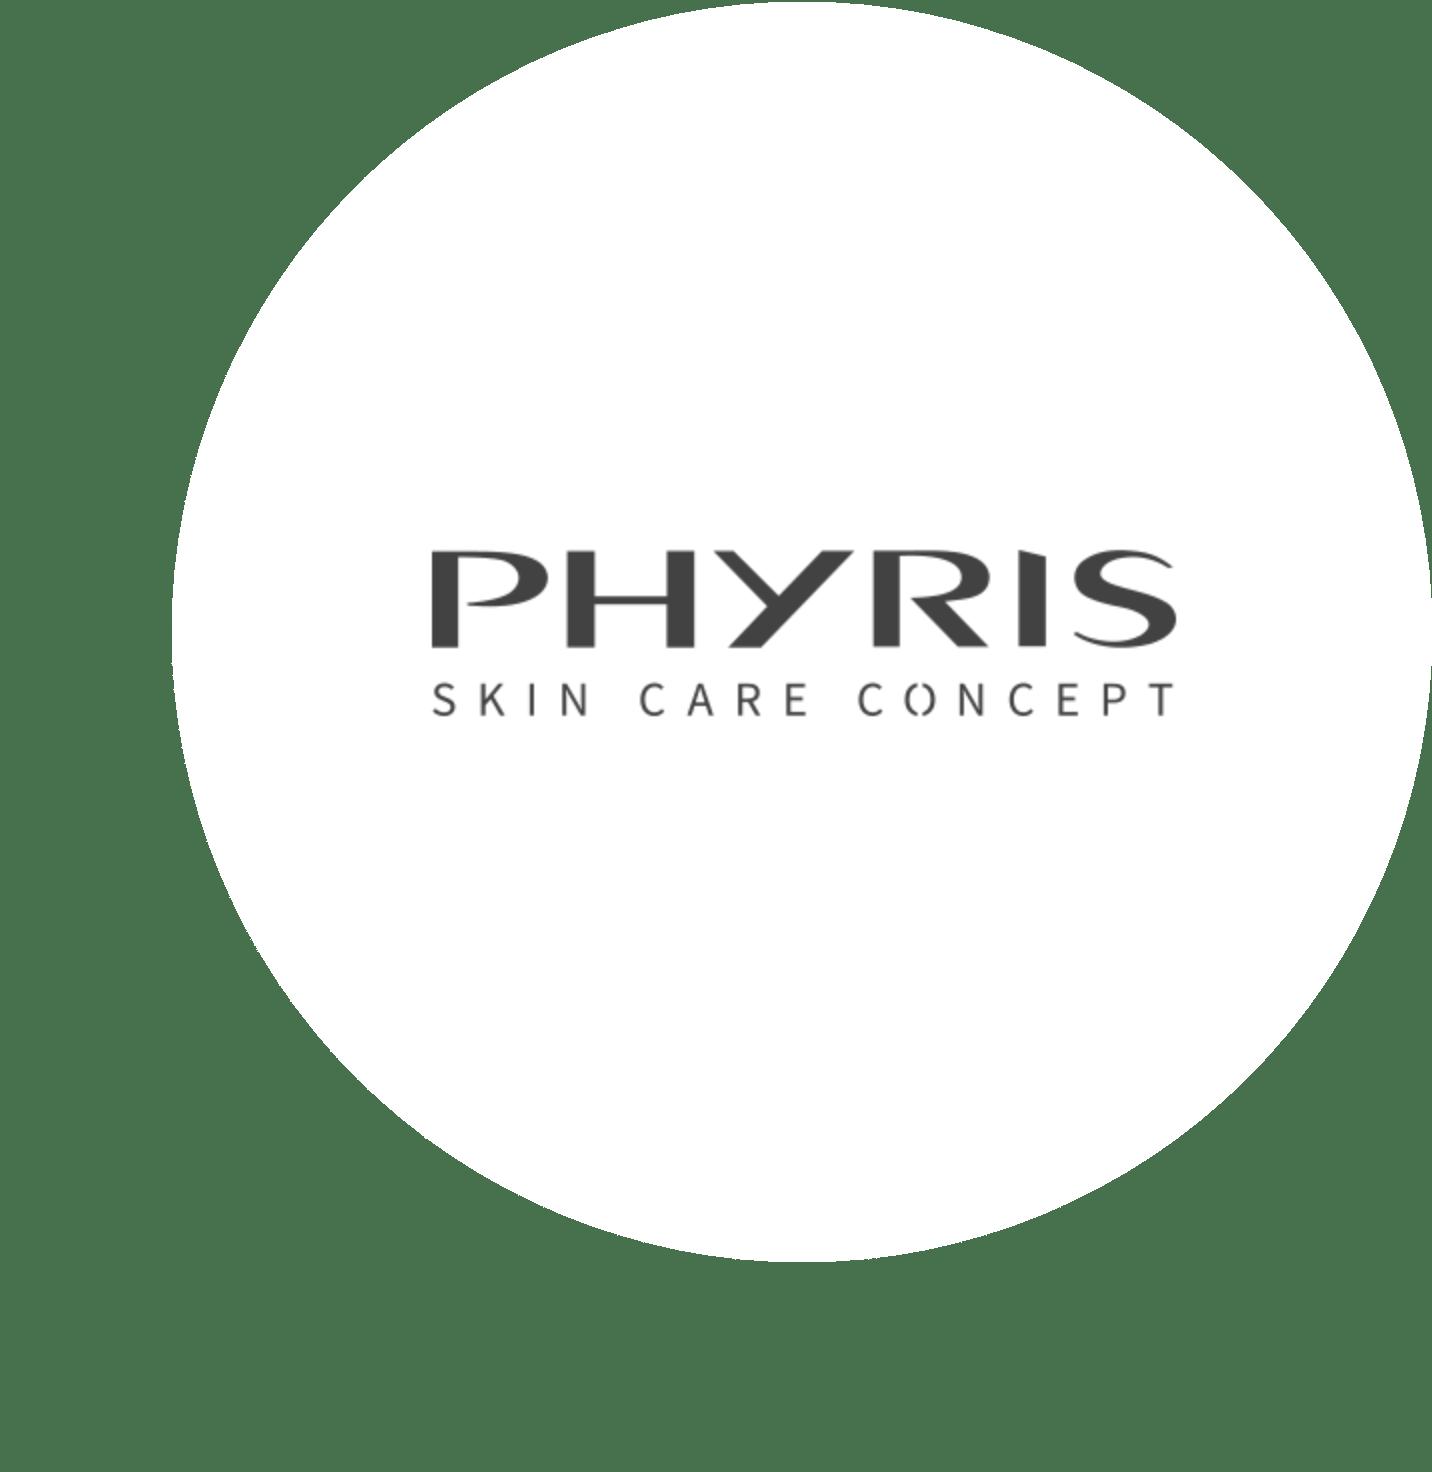 Phyris-min